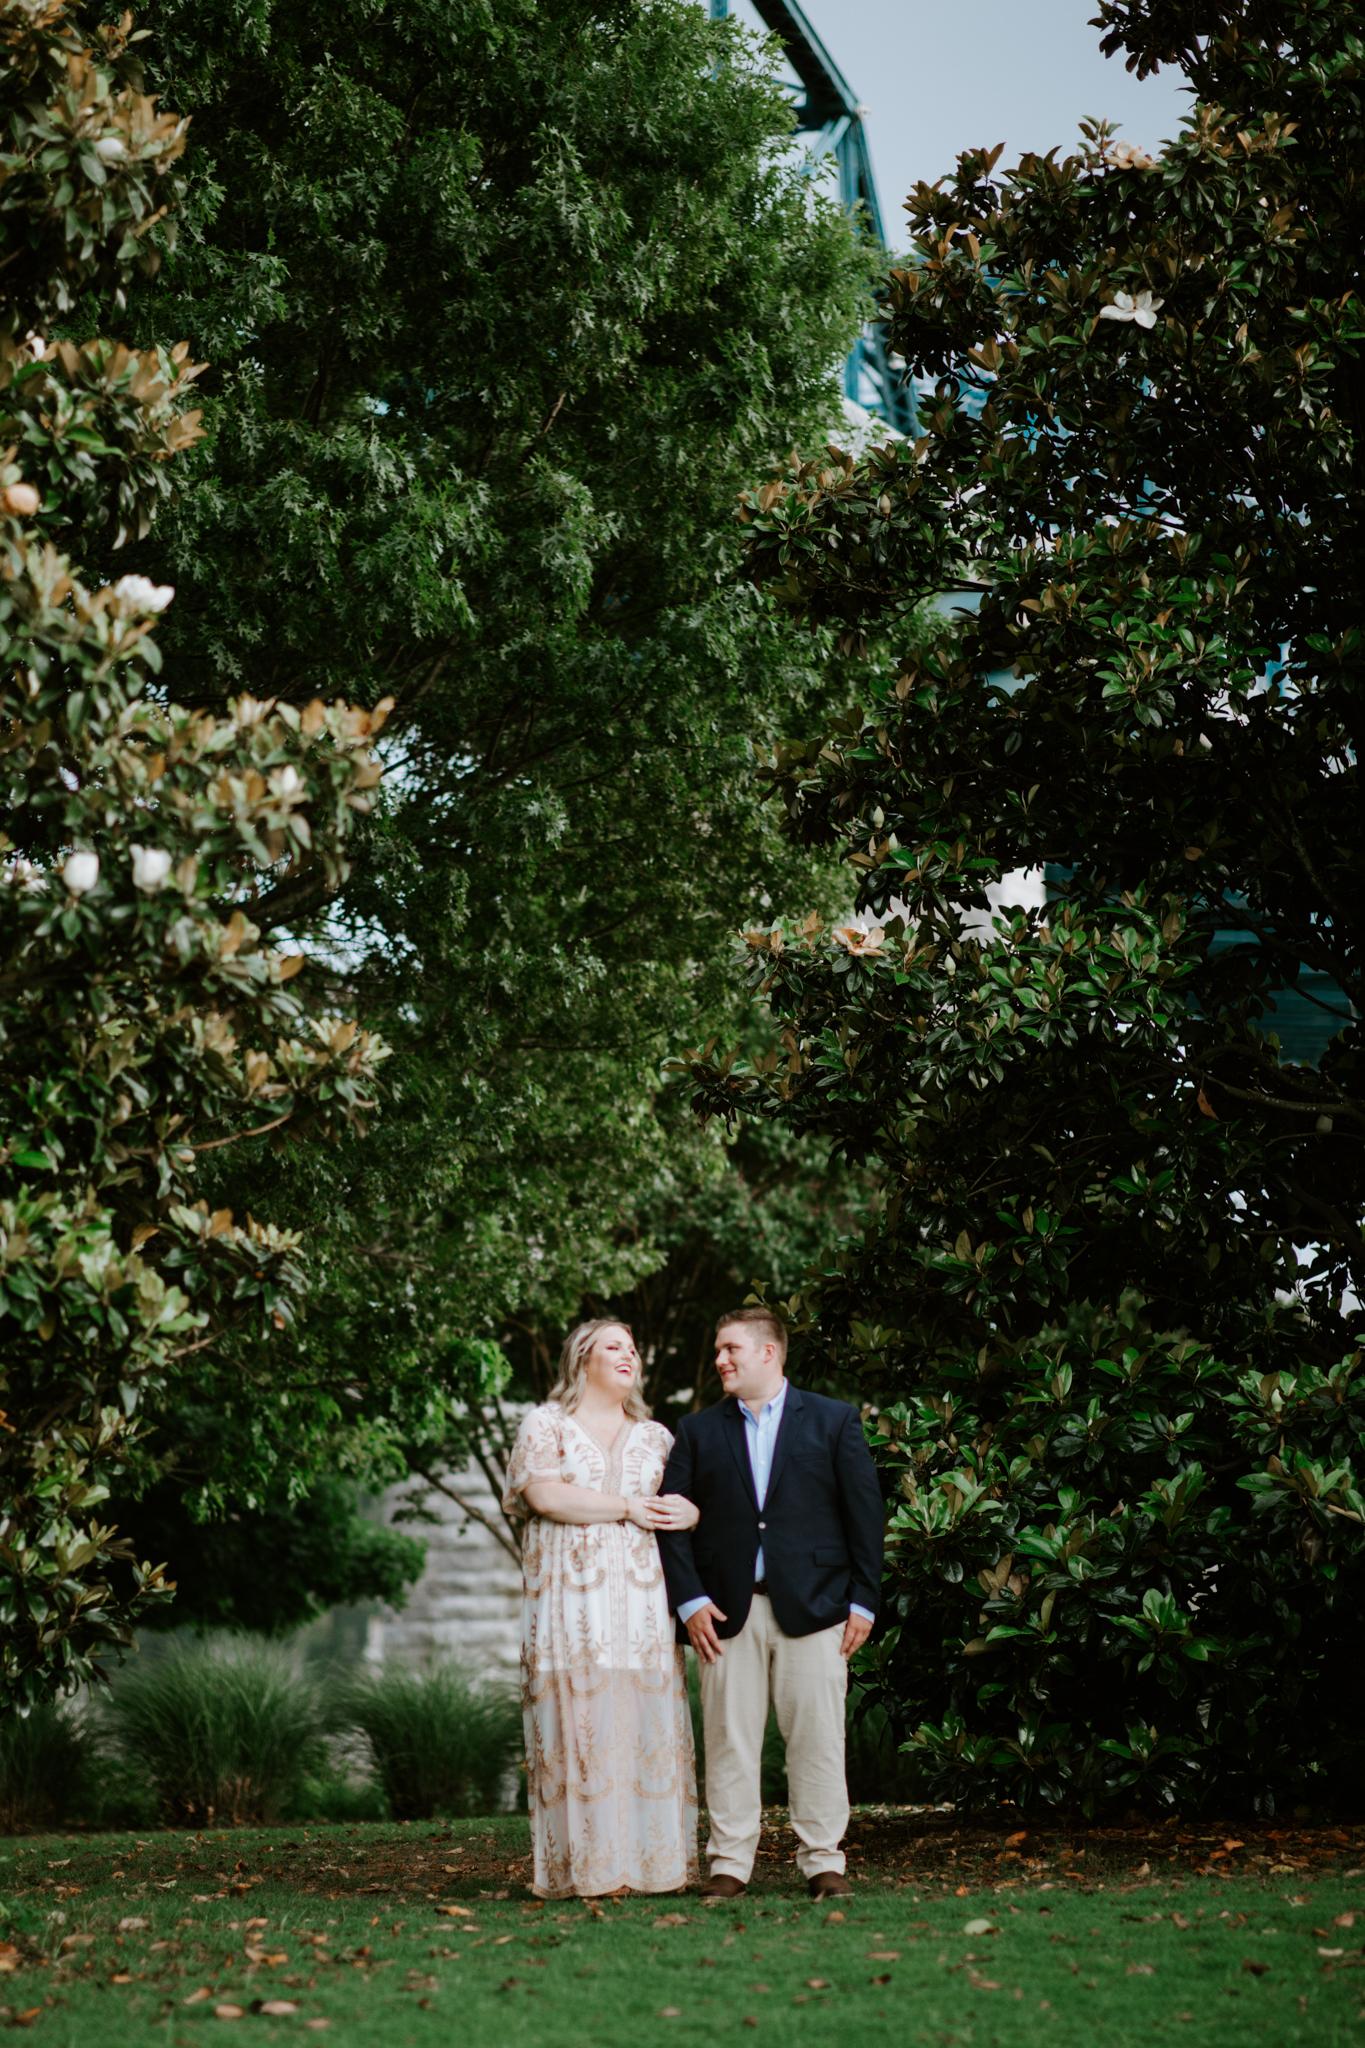 Ryley + Dalton + Chattanooga + Nashville + Knoxville+ Wedding + Engagement + Photographer-54.jpg